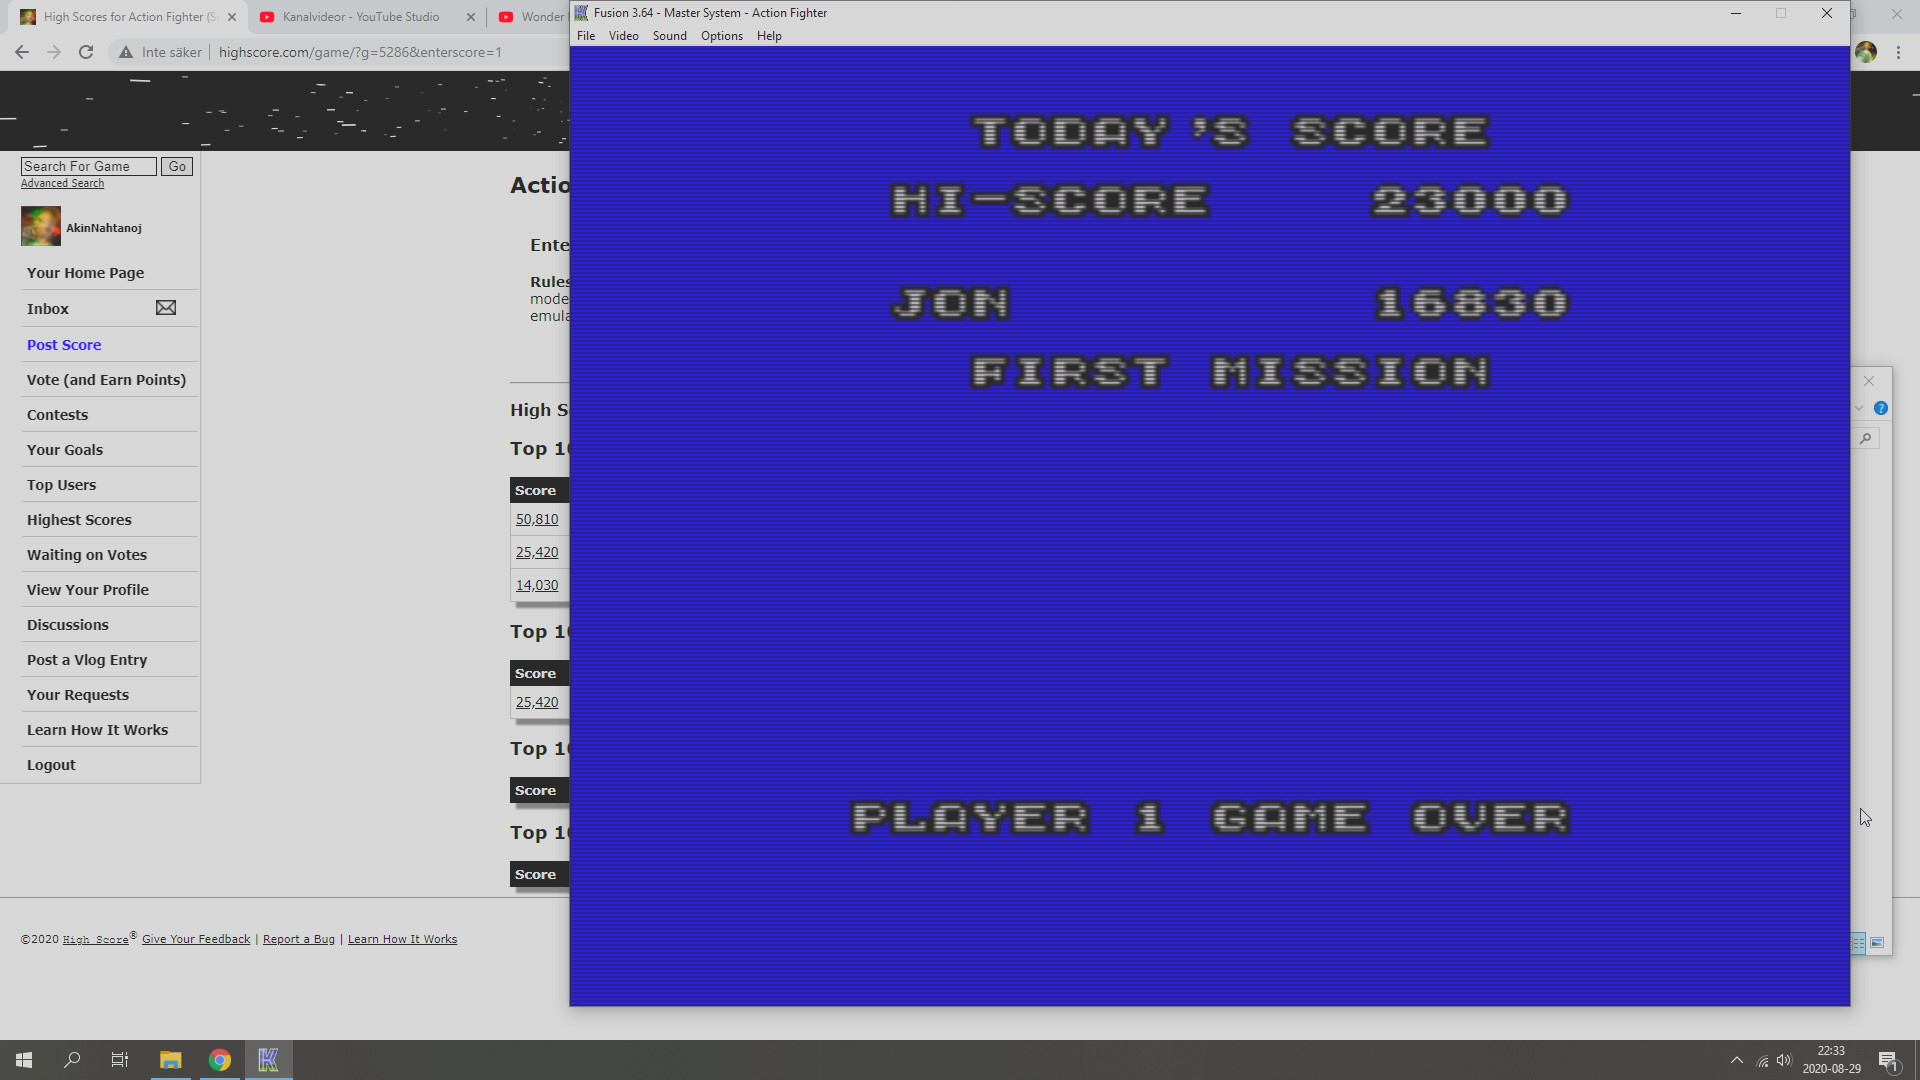 AkinNahtanoj: Action Fighter (Sega Master System Emulated) 16,830 points on 2020-08-29 15:42:49